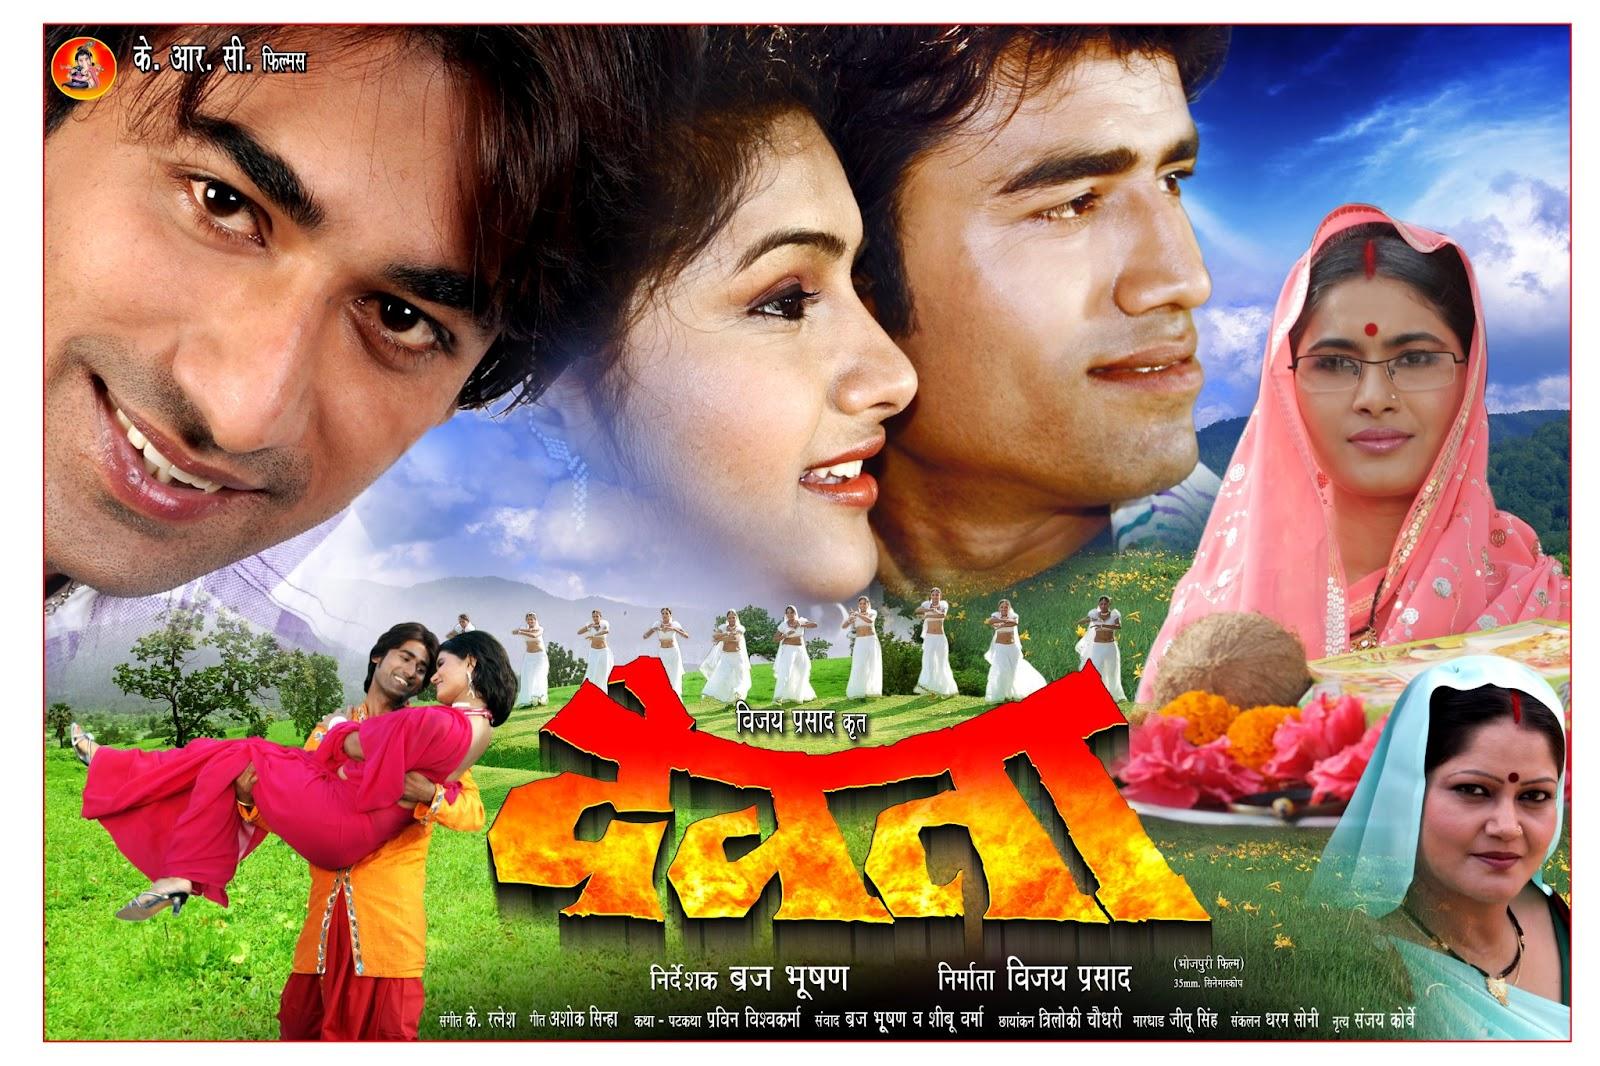 songs pk bhojpuri movie album songs downloads bhojpuri bhojpuri video